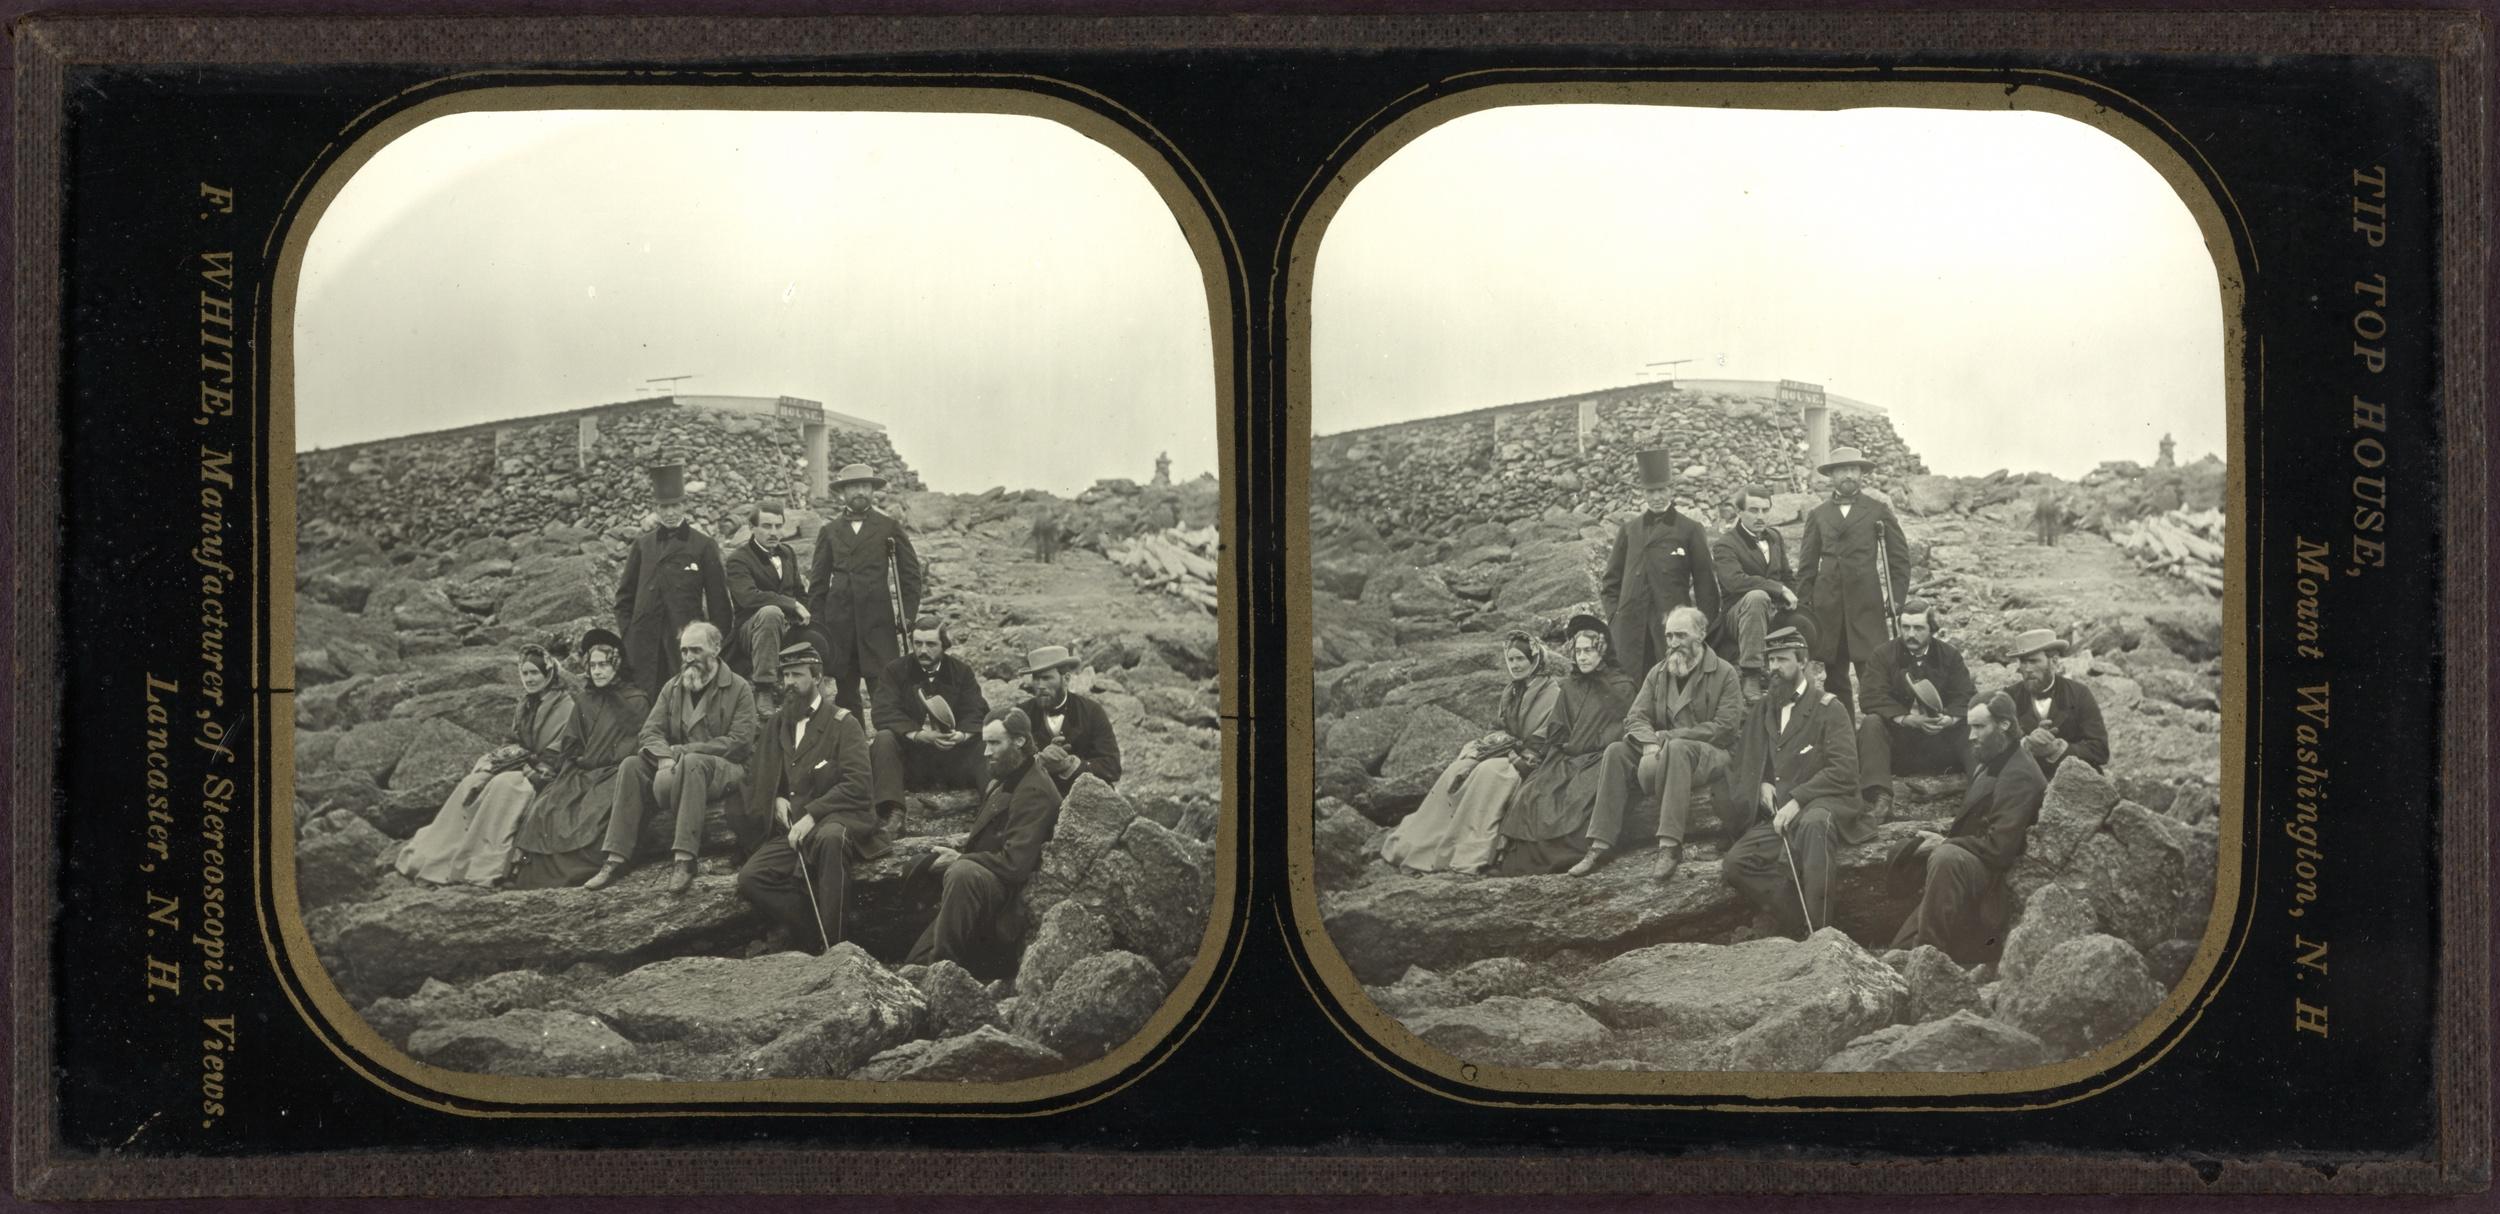 Tip_Top_House,_Mount_Washington,_N._H,_by_White,_Franklin,_1813-1870.jpg